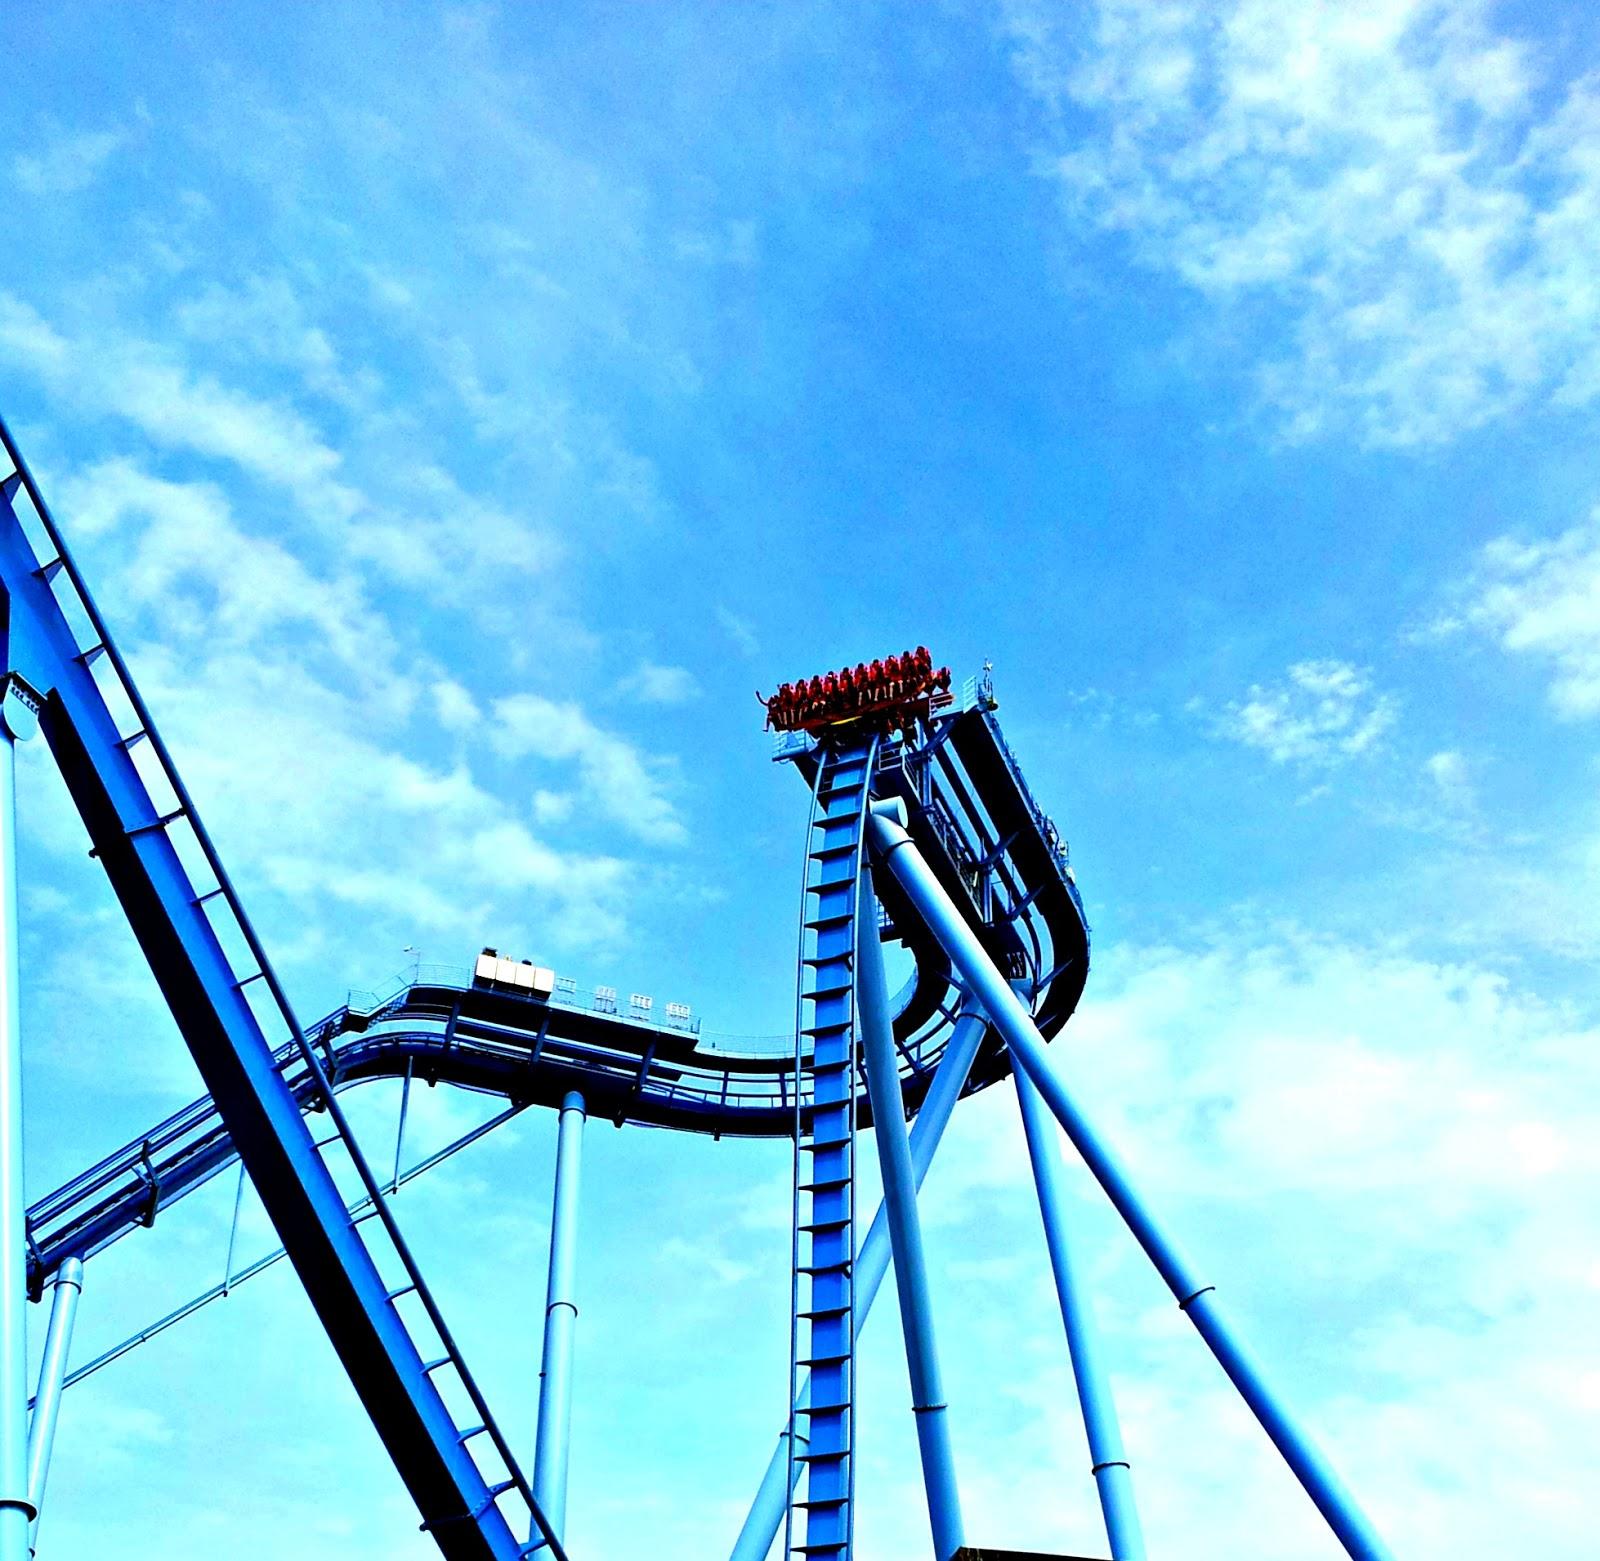 Hines Sight Blog Instagram Travel The Thrill Of Busch Gardens In Williamsburg Va